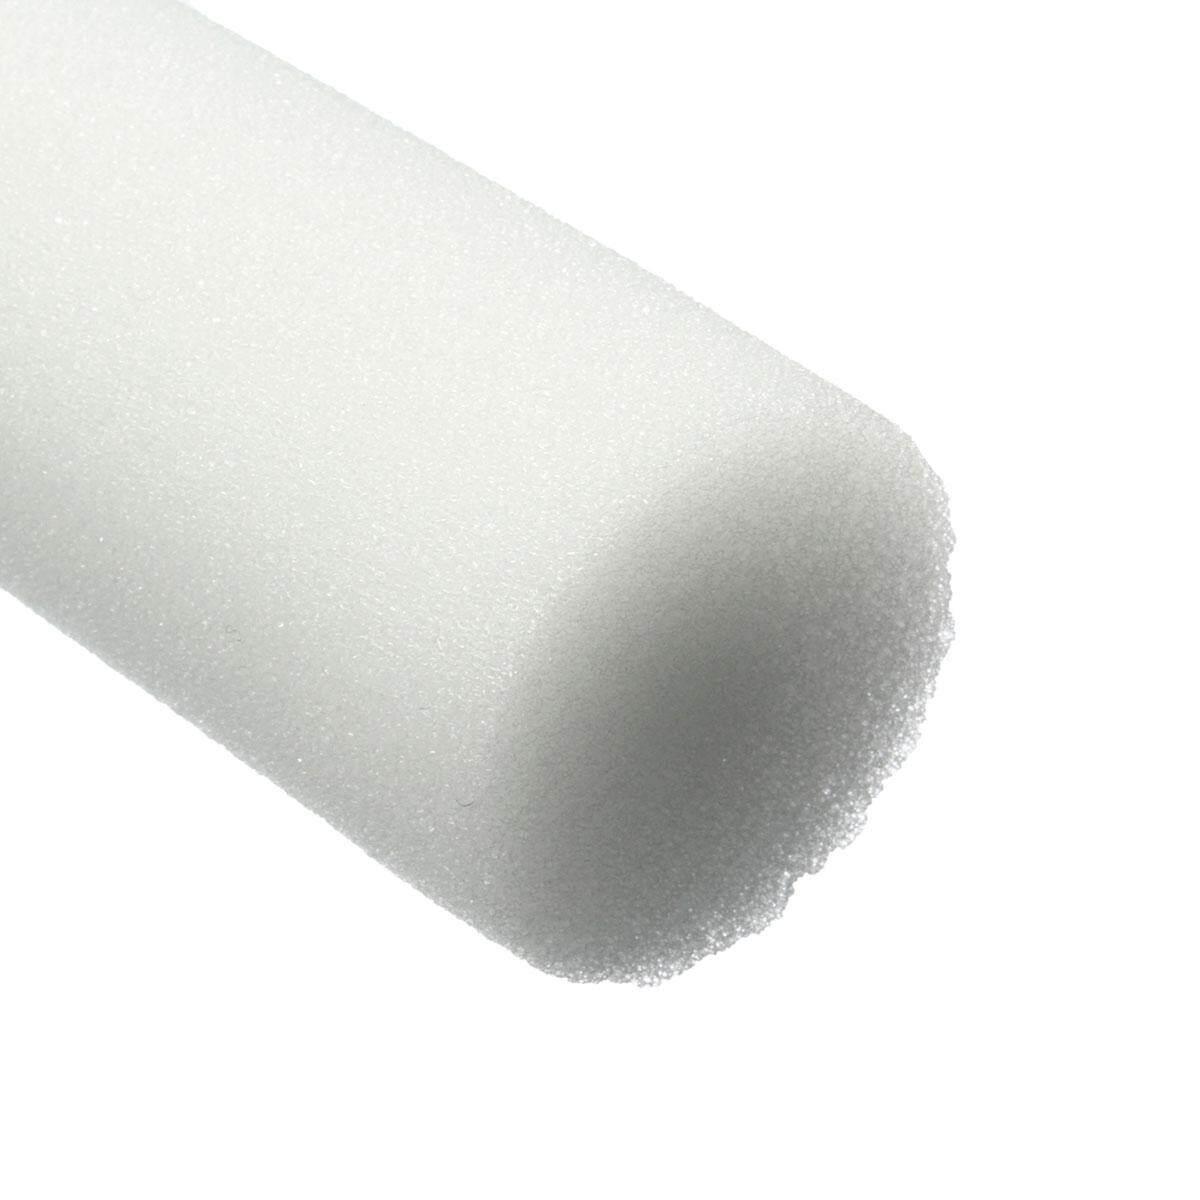 10pcs Paint Foam Sponge Rollers Decorators Brush Evenly /& Smooth Home Tool 100mm